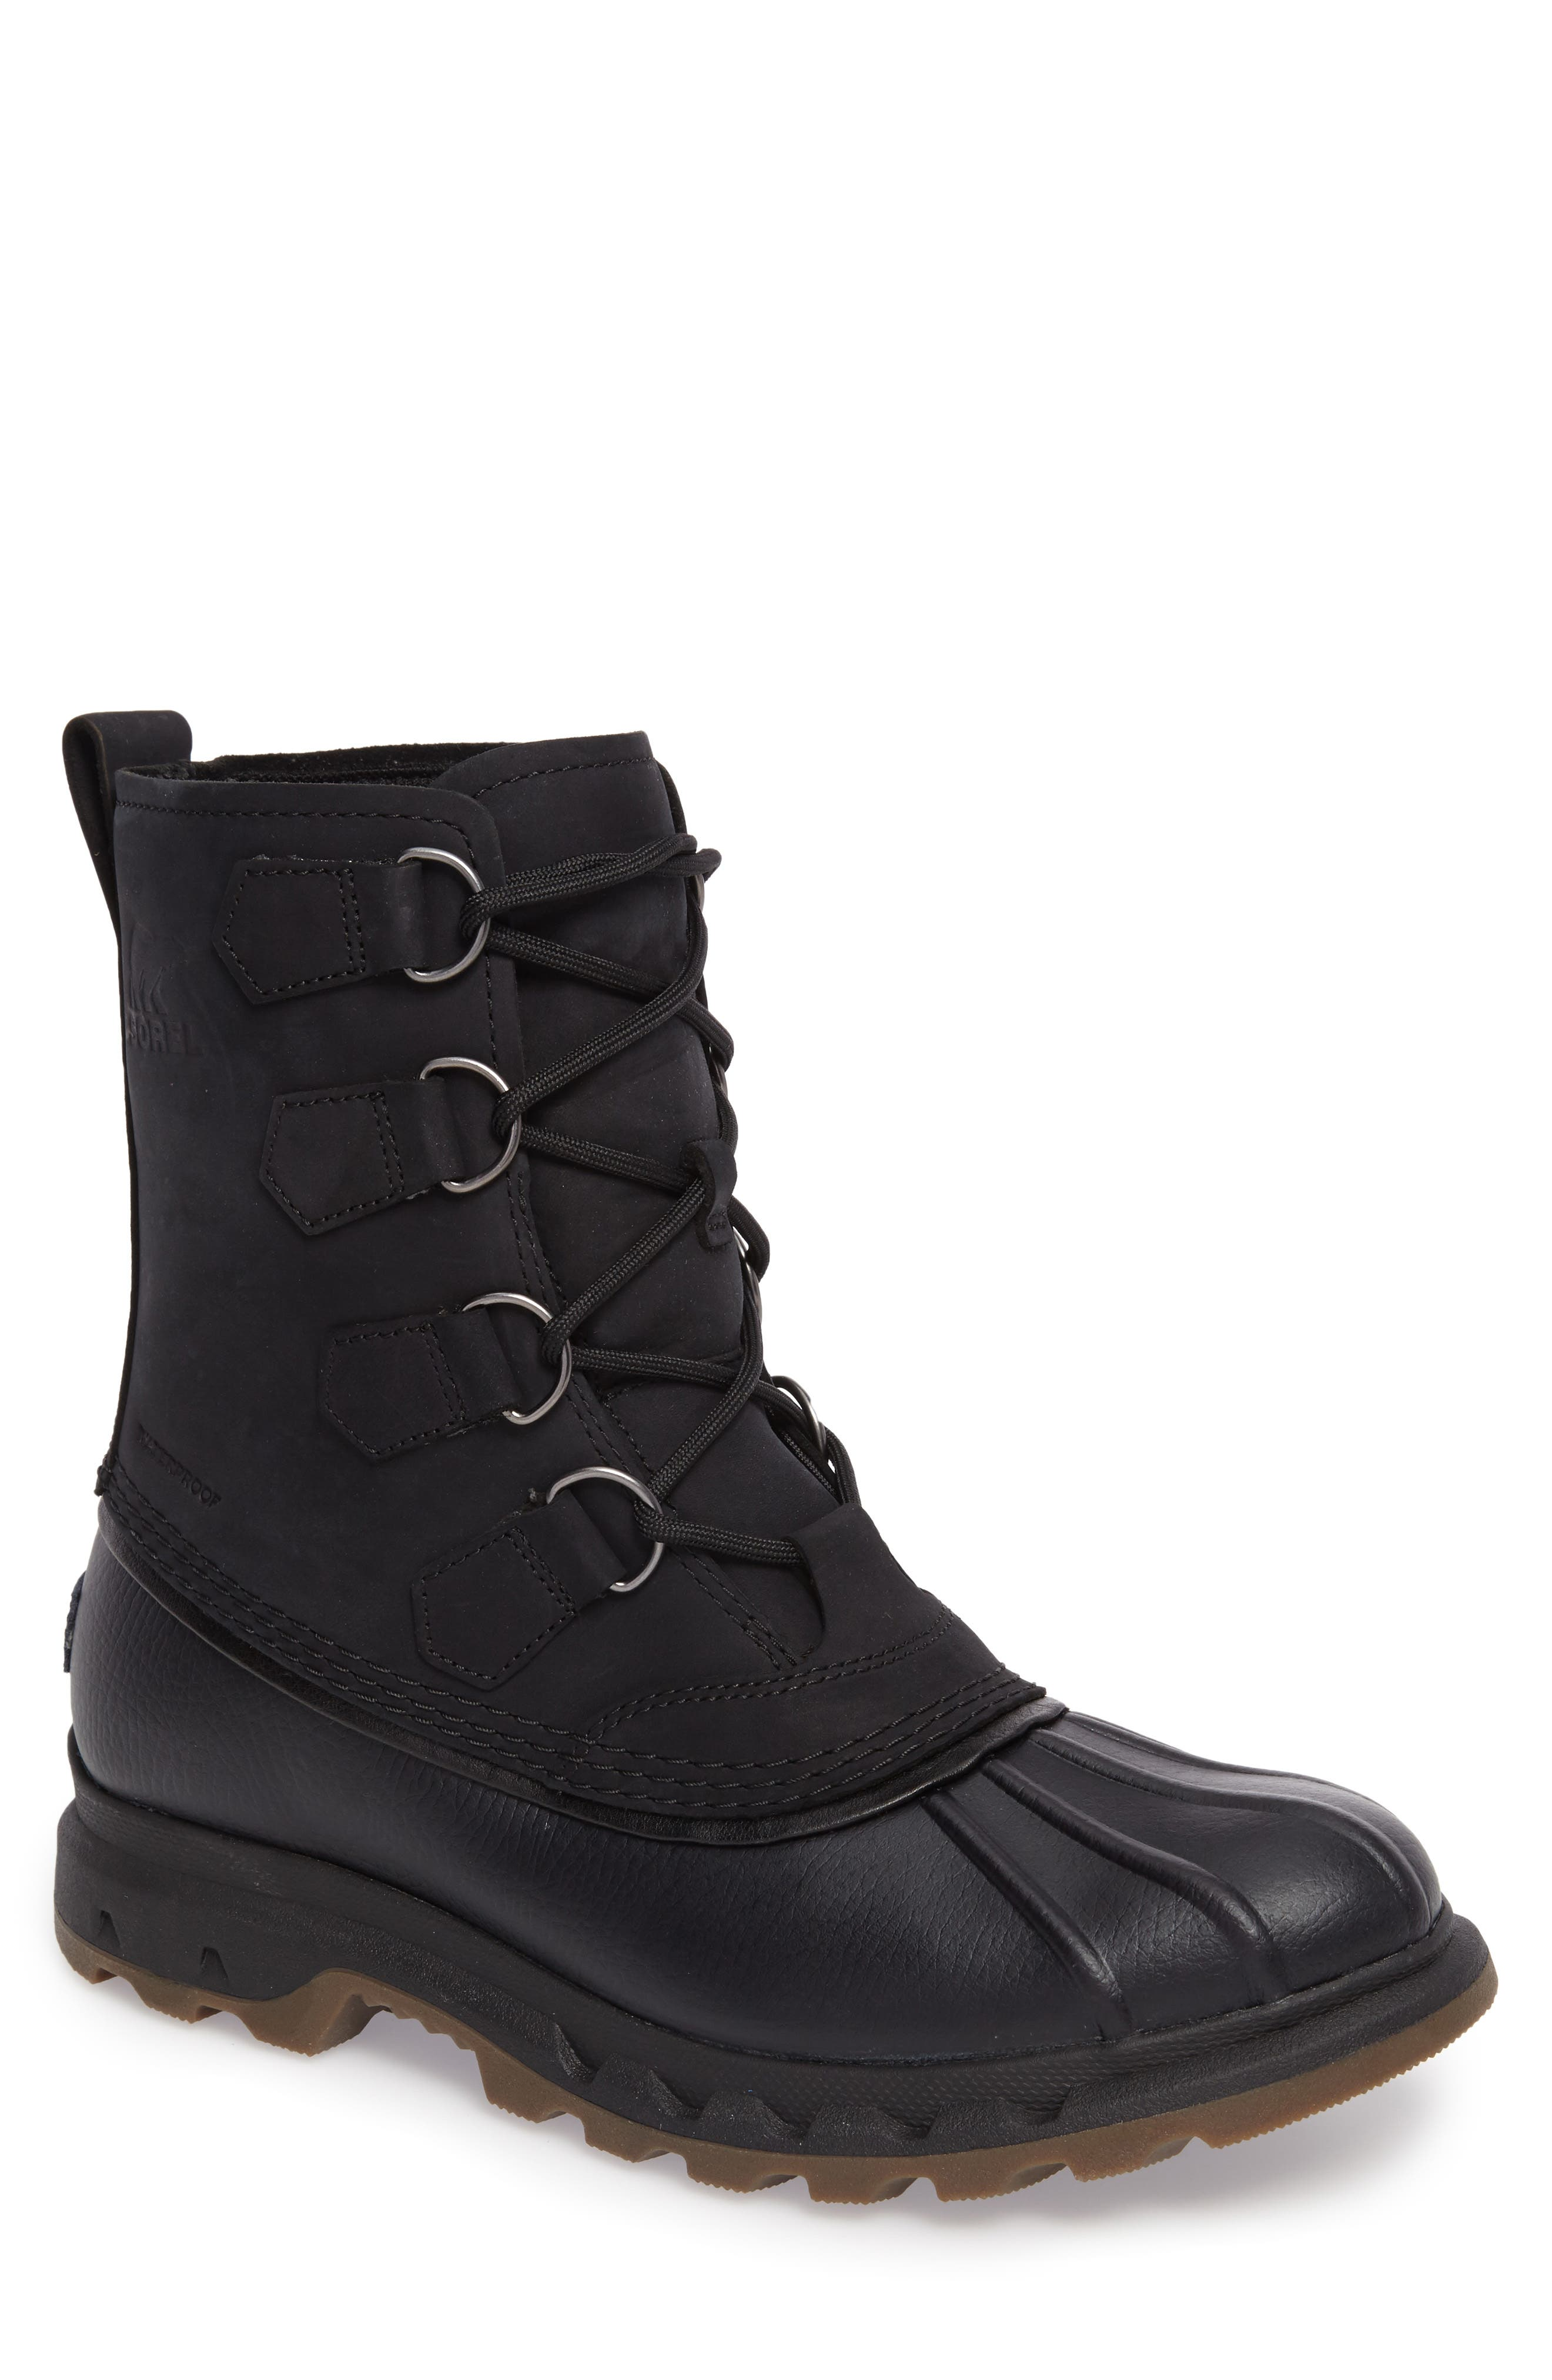 Portzman Classic Rain Boot,                             Main thumbnail 1, color,                             Black